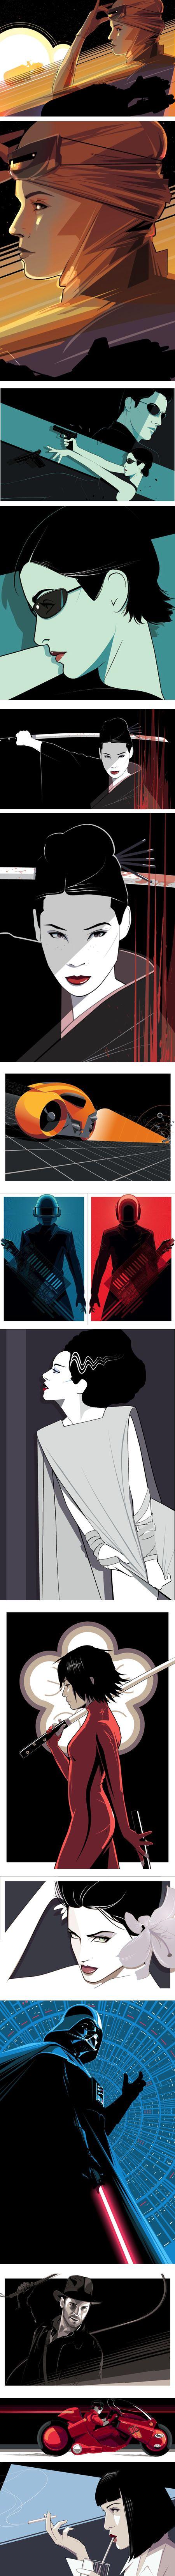 Craig Drake, posters, Star Wars